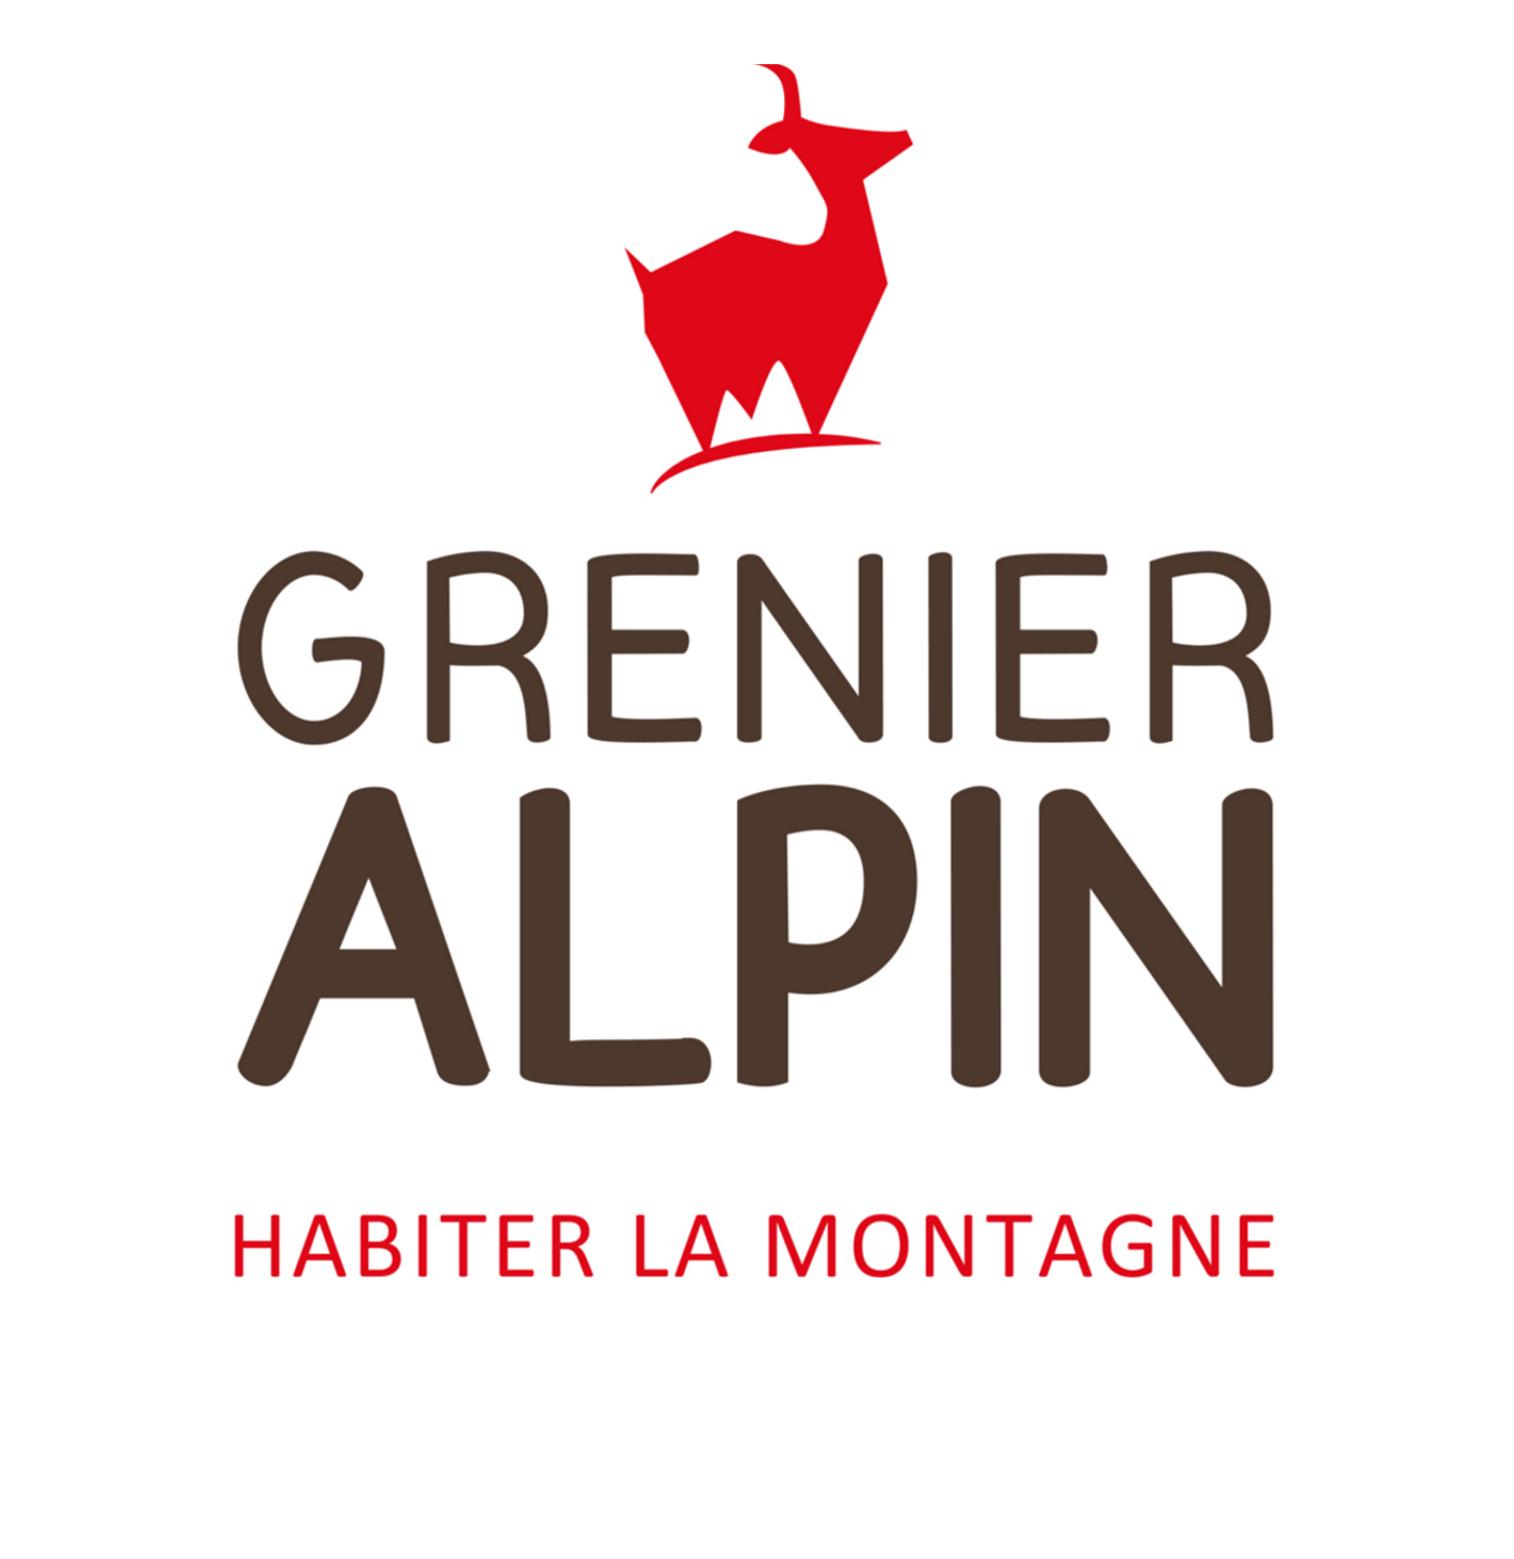 Grenier Alpin  Scoopit -> Grenier Alpin